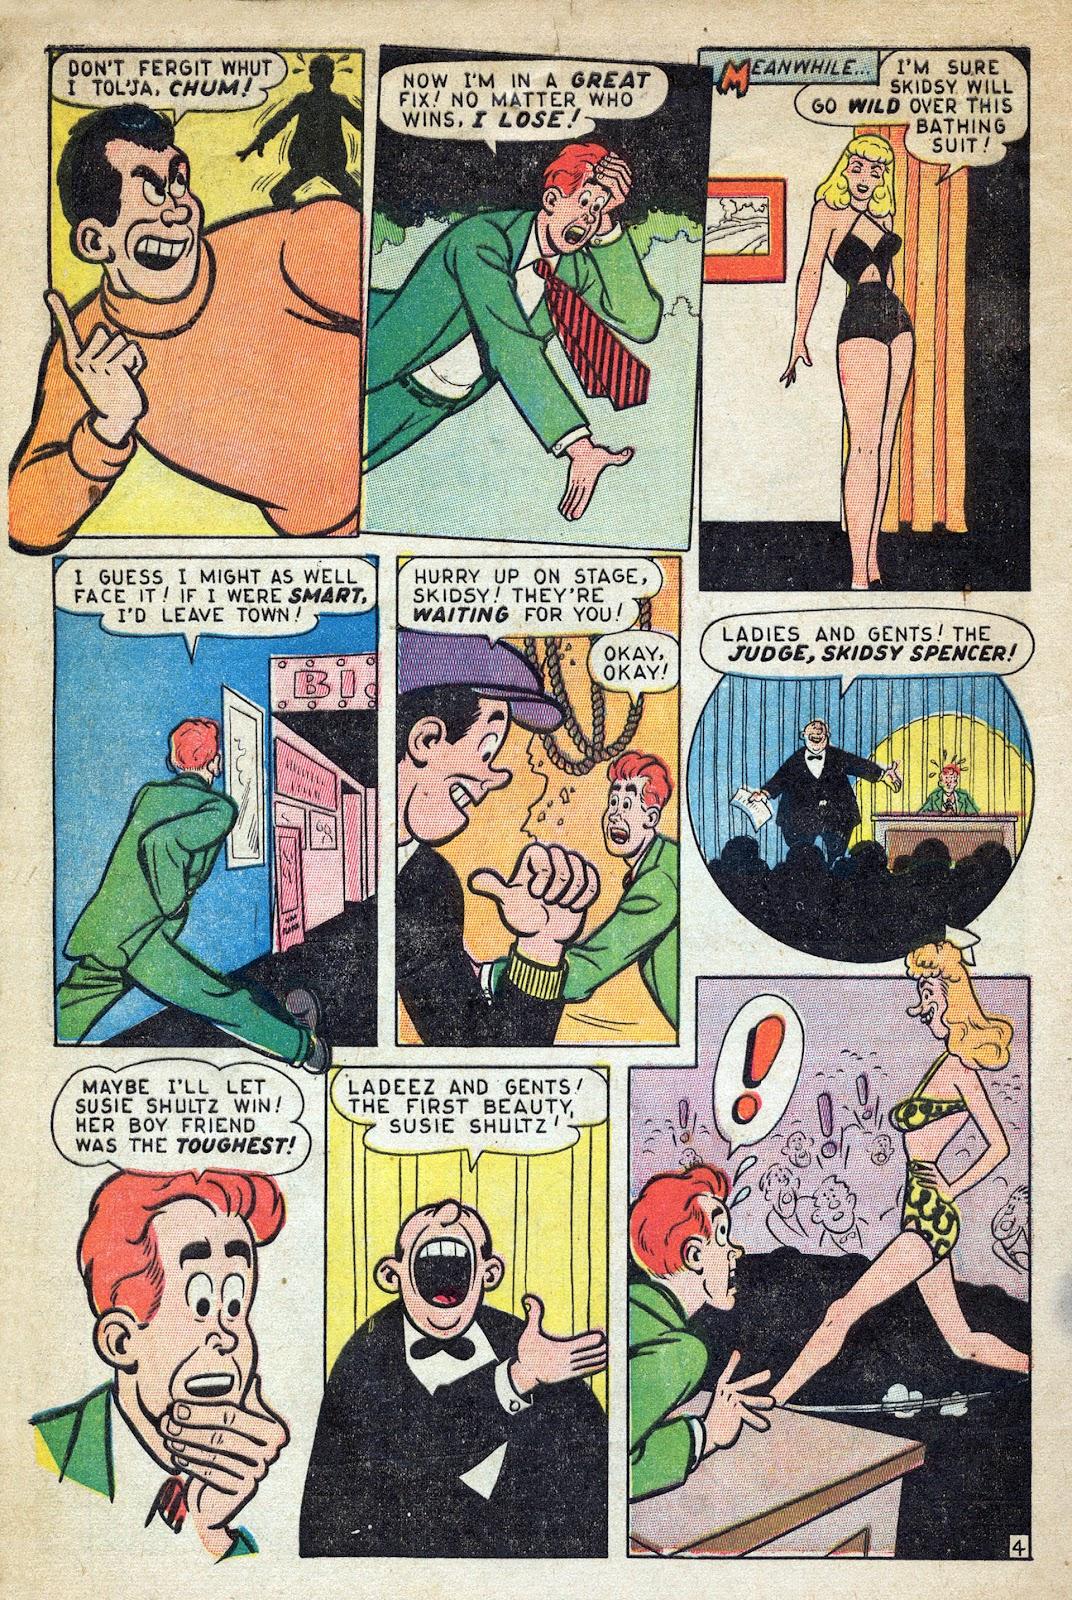 Read online Gay Comics comic -  Issue #31 - 6